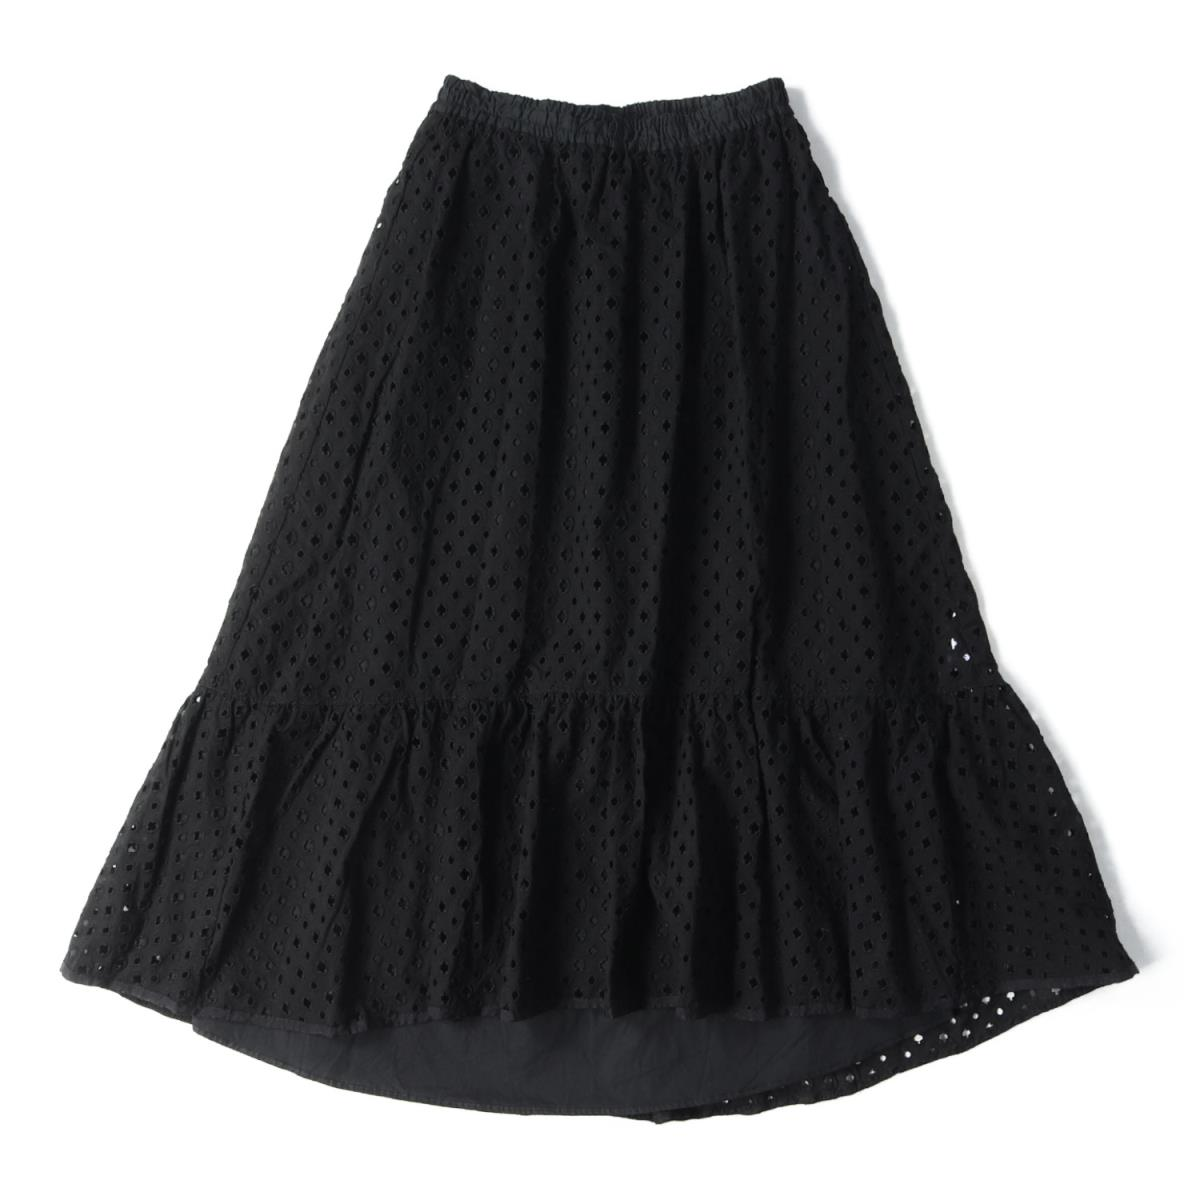 1/2 Un-Demi アンドゥミ スカート コットン カットワークレース 刺繍 スカート ブラック 38 【レディース】【中古】【美品】【K2584】